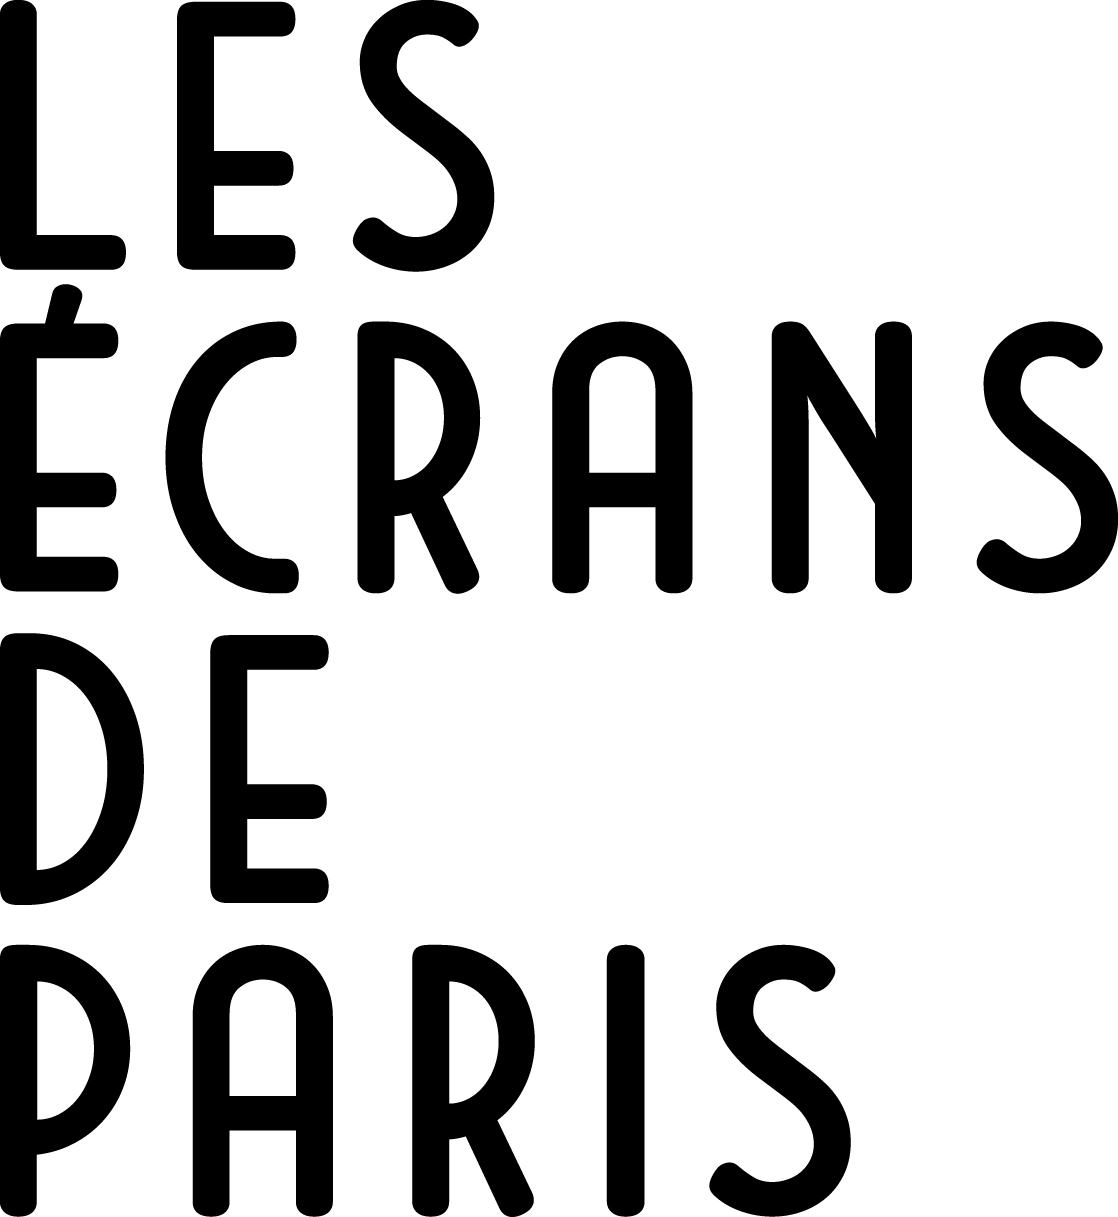 http://www.lesecransdeparis.fr/